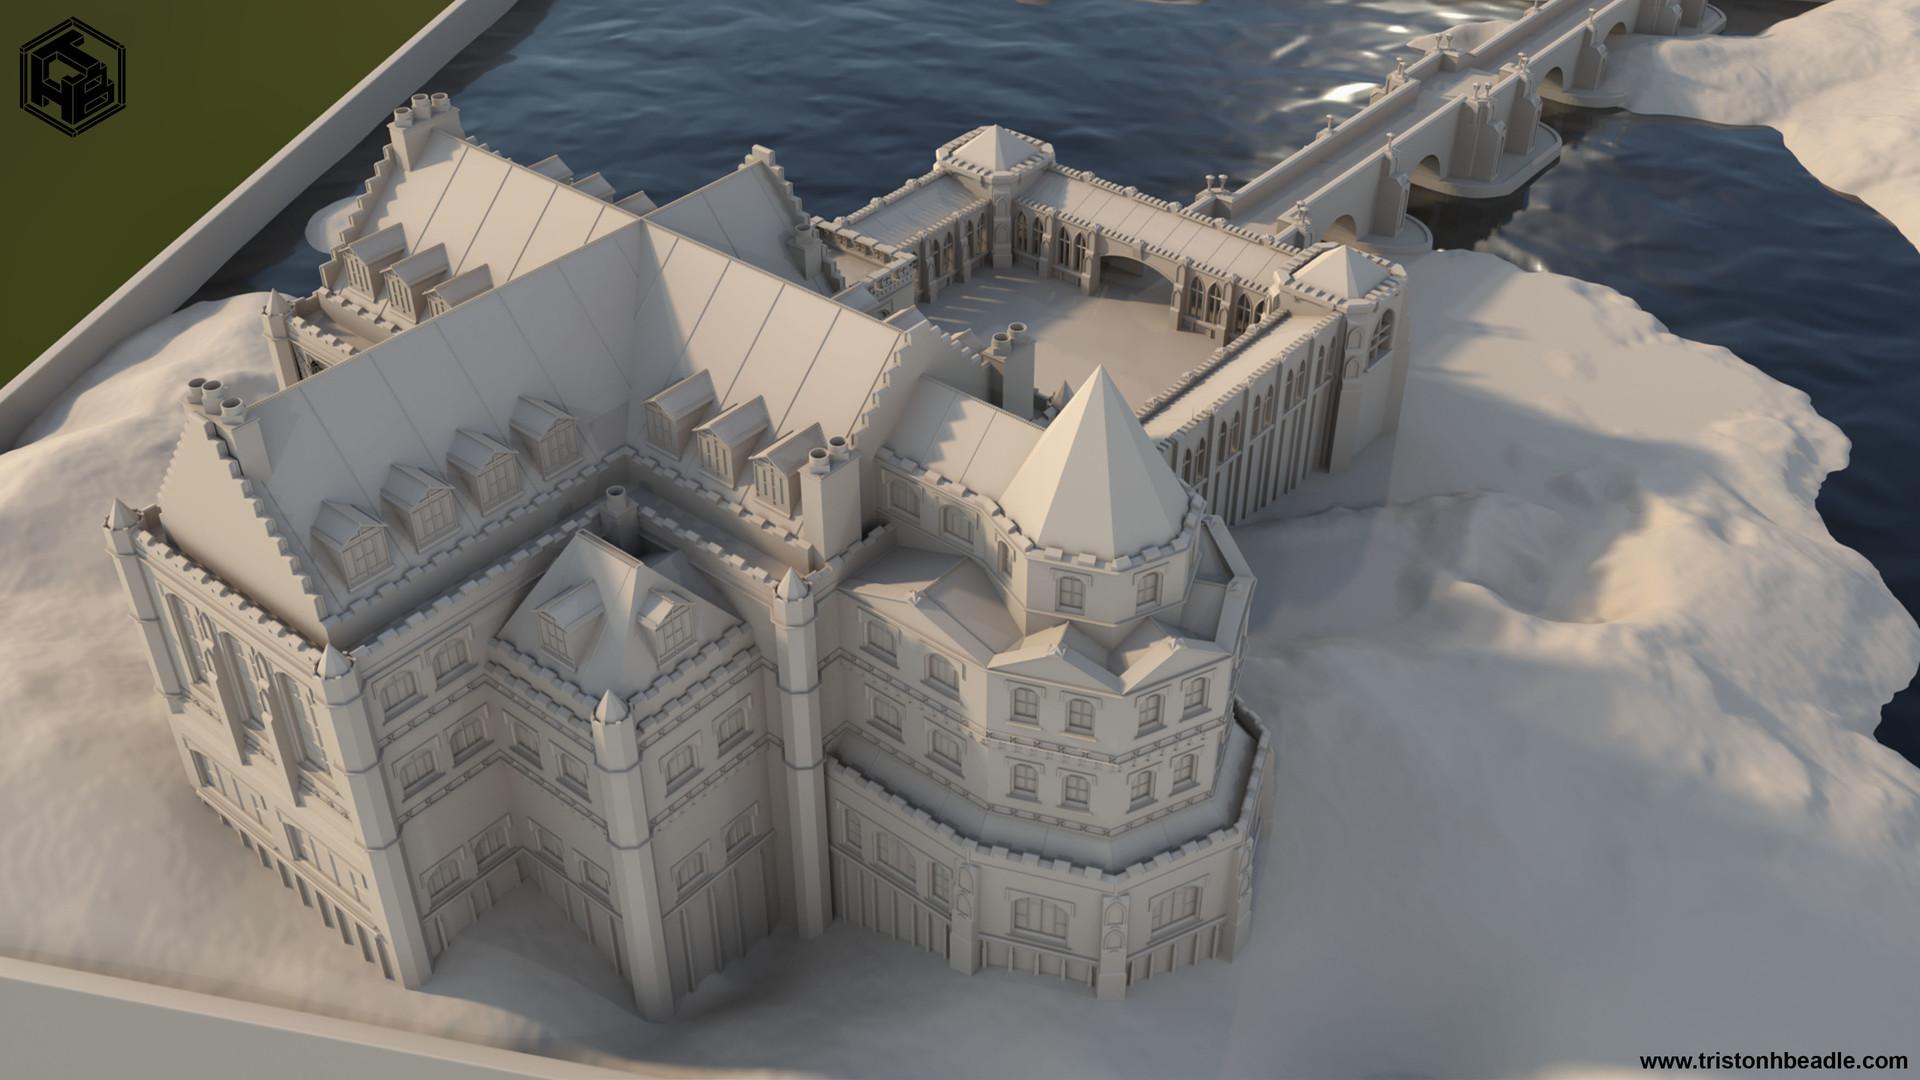 Triston beadle castle 03